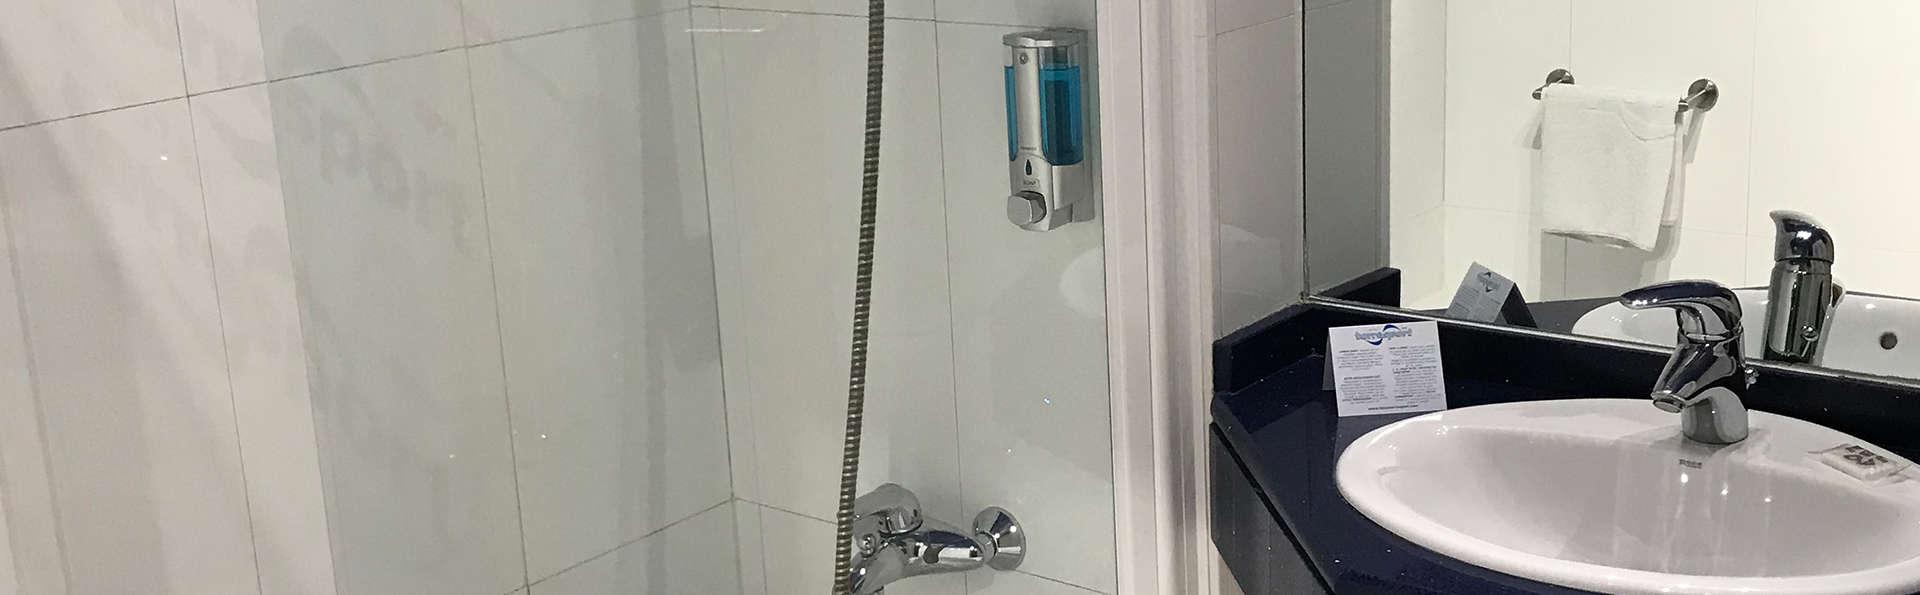 Hotel Torresport Spa - EDIT_NEW_Bathroom.jpg